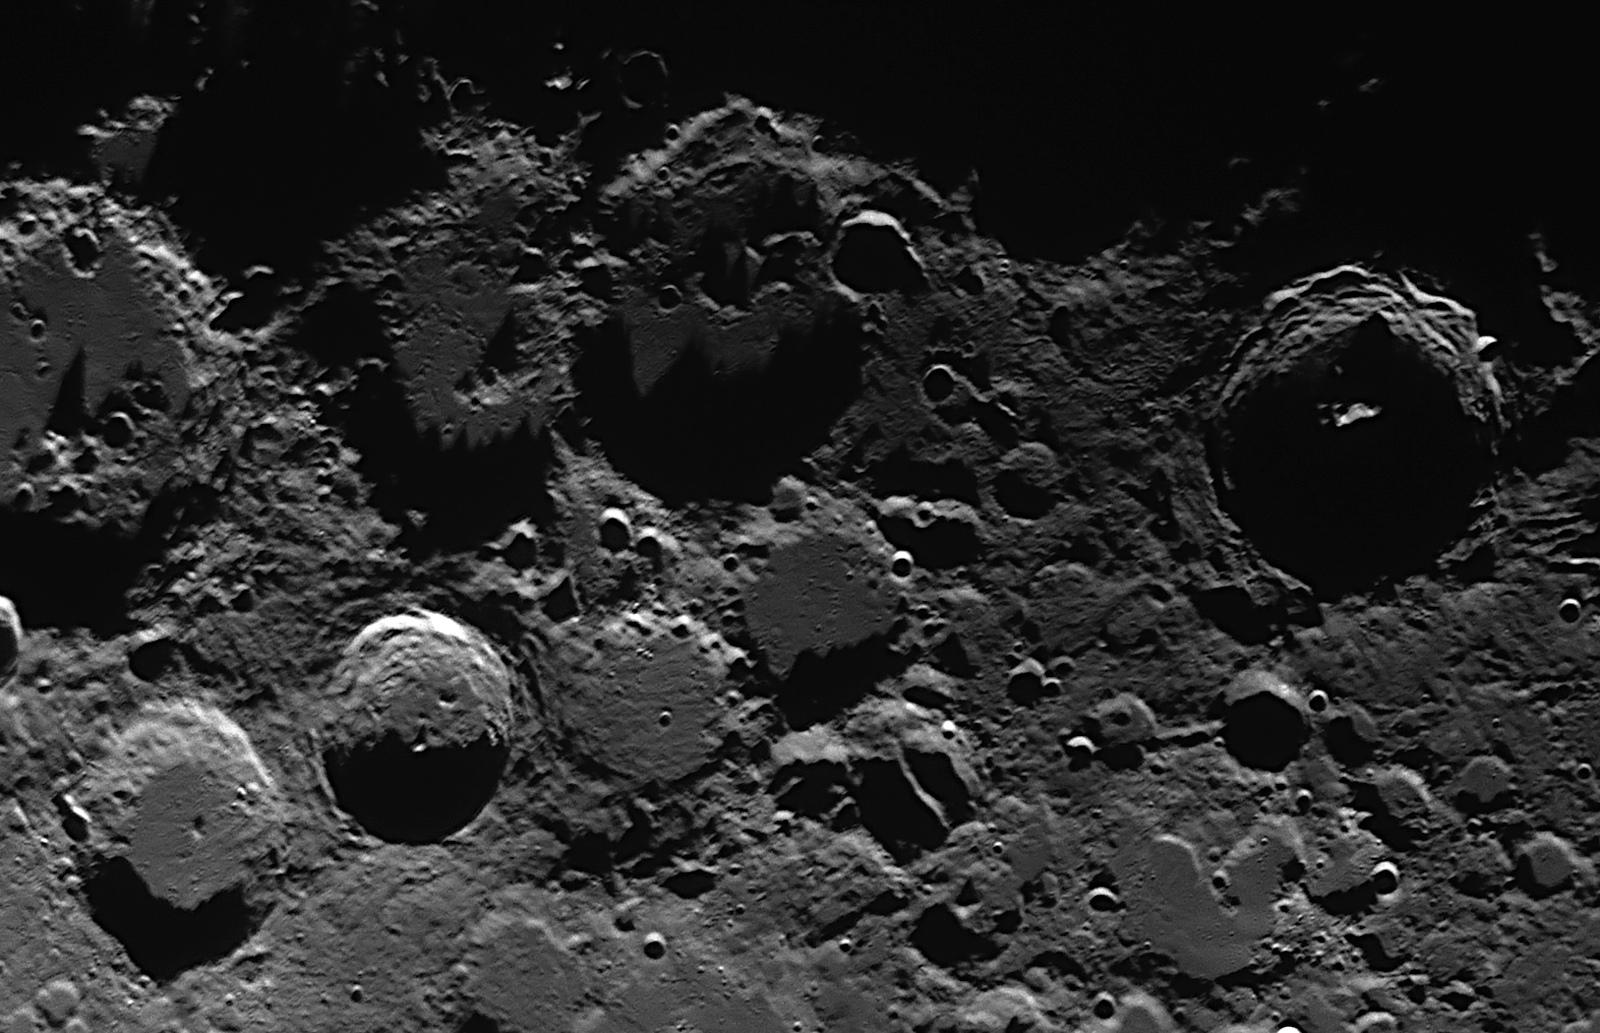 2019-12-04-2005_6-R-Moon.jpg.52f1c8e5a3b4e80d103bac78f17adb3e.jpg